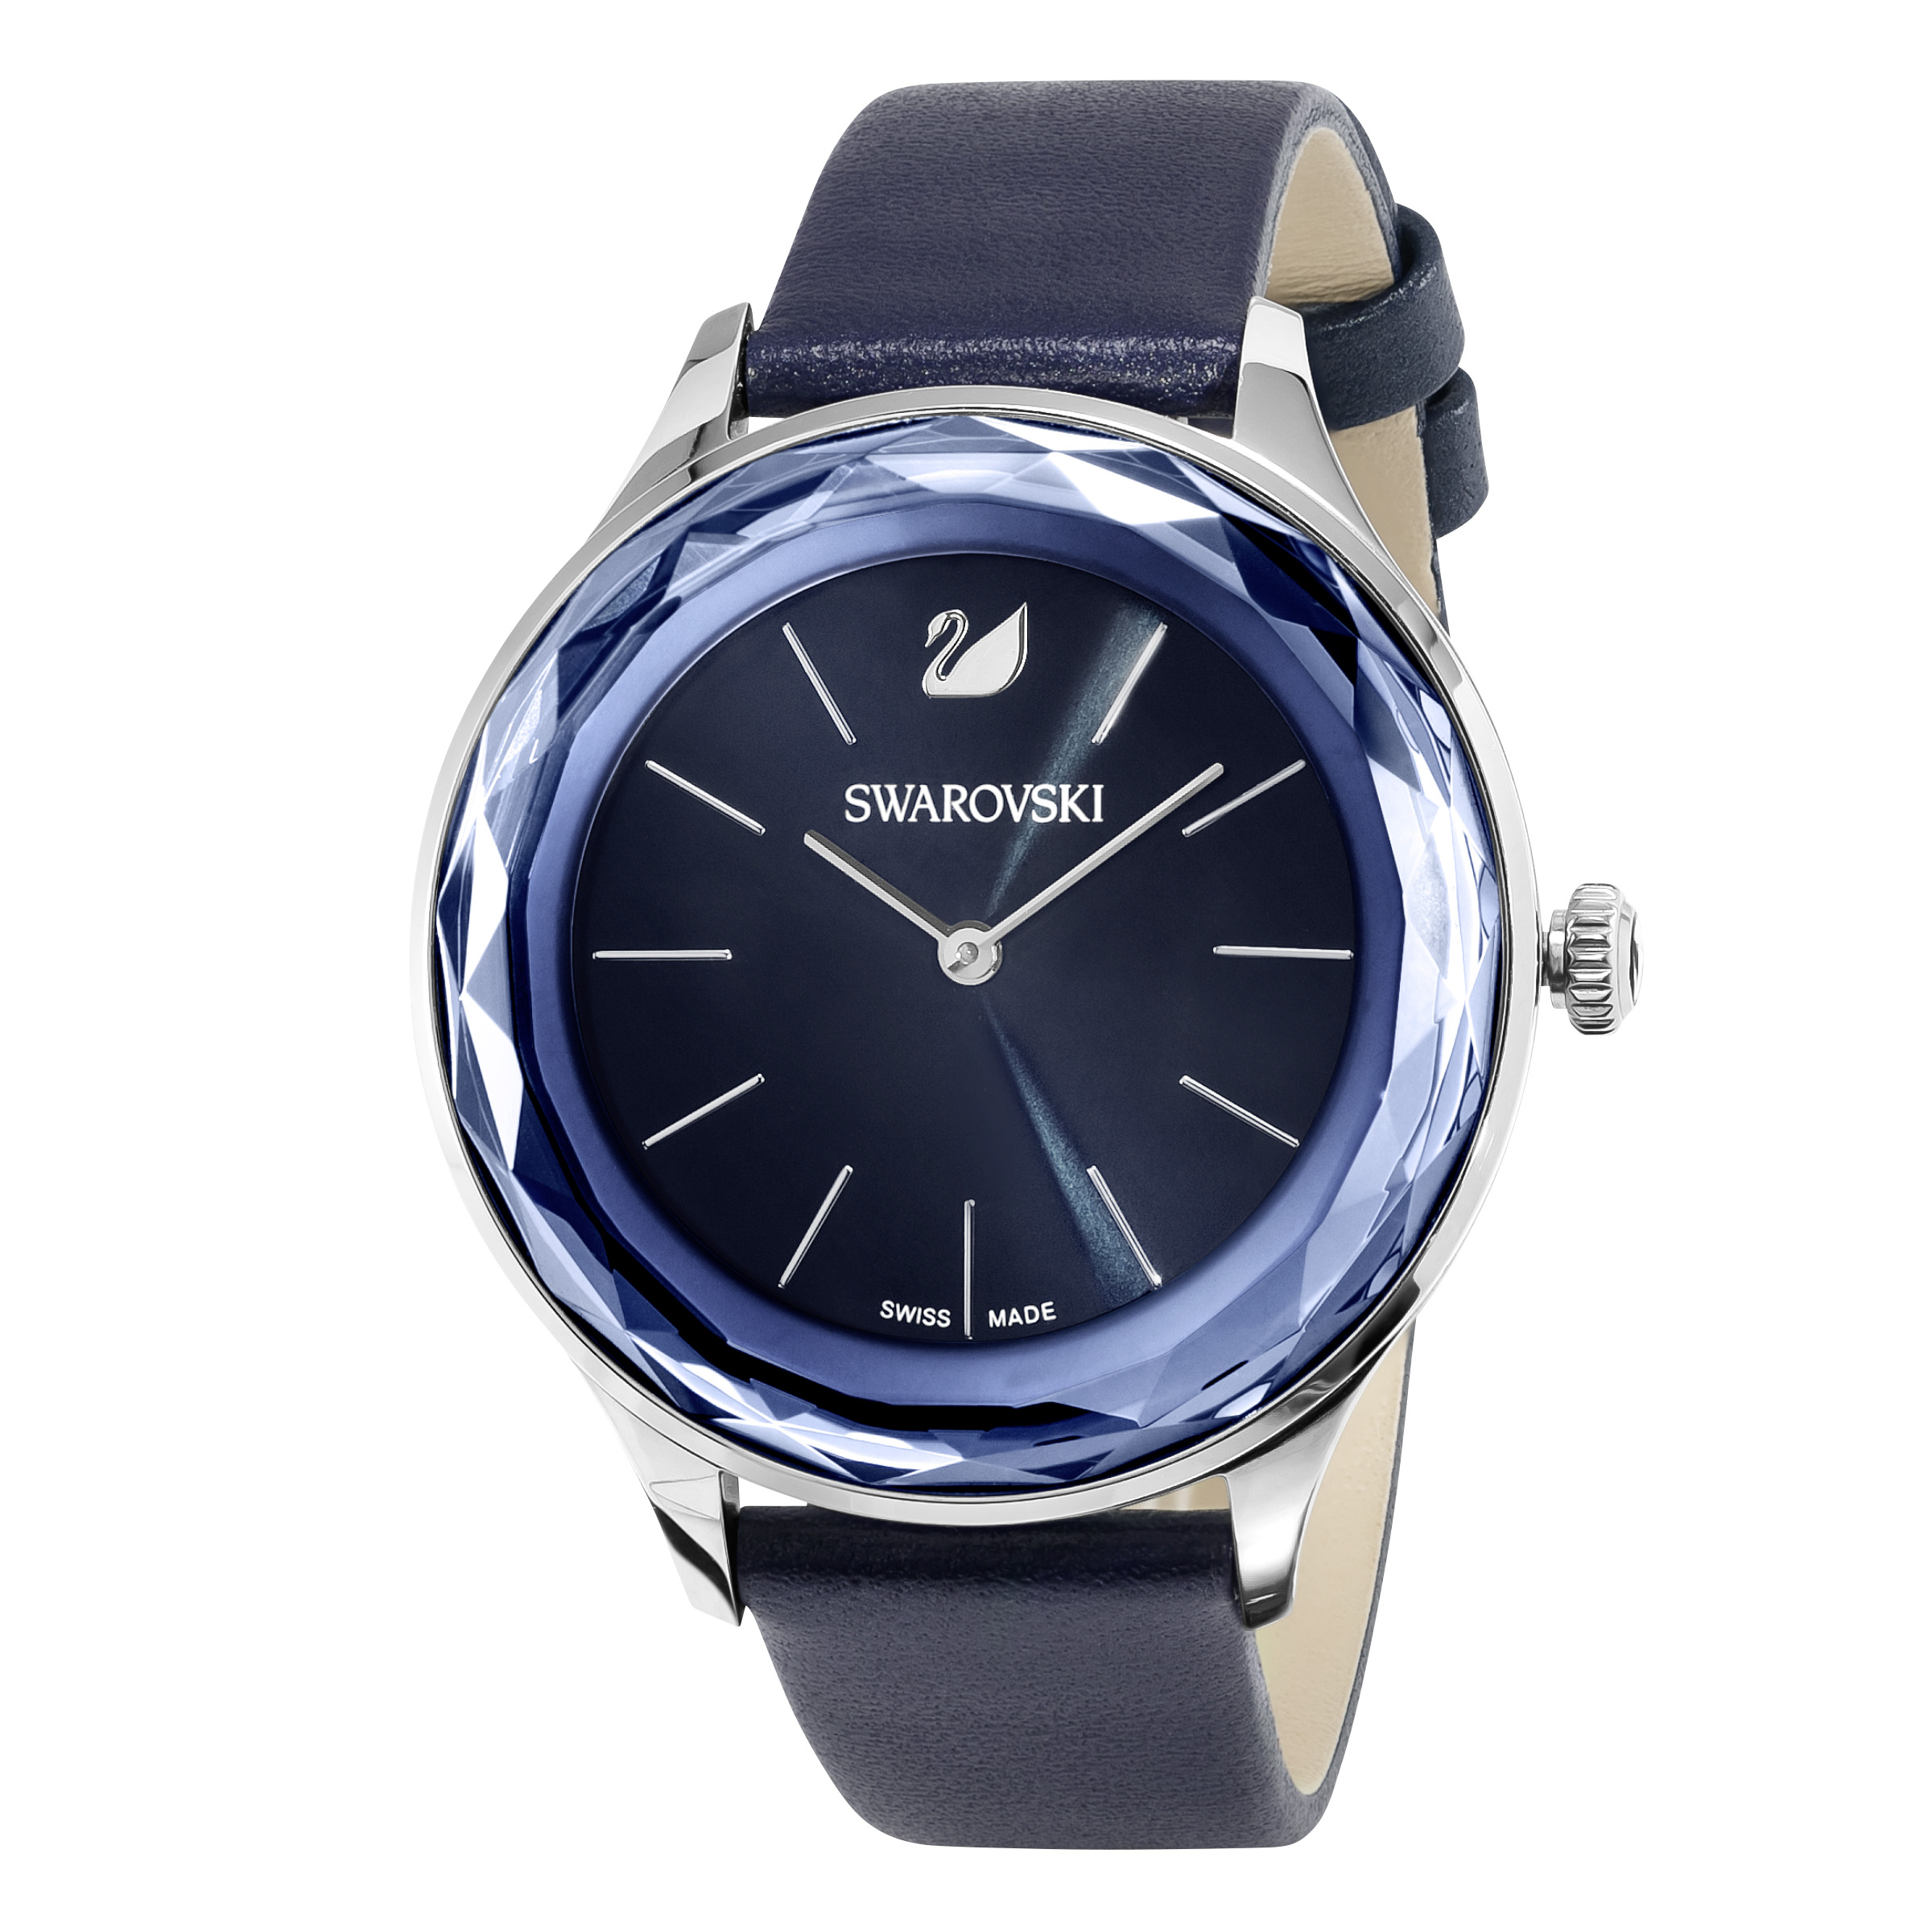 Montre Octea Nova, Bracelet en cuir, bleu, acier inoxydable Swarovski